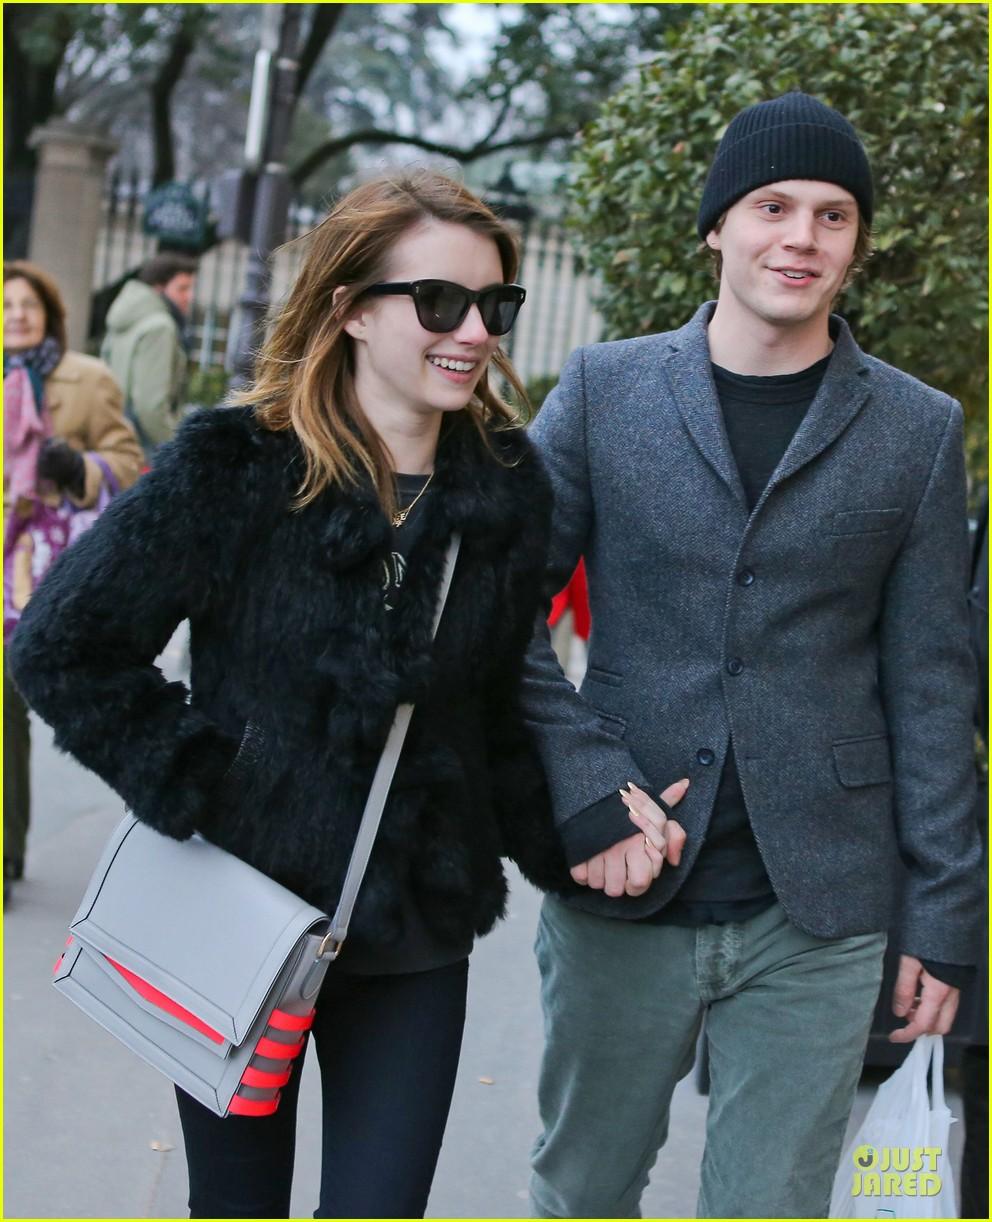 http://cdn02.cdn.justjared.com/wp-content/uploads/2013/02/roberts-paris/emma-roberts-evan-peters-paris-sightseeing-couple-10.jpg